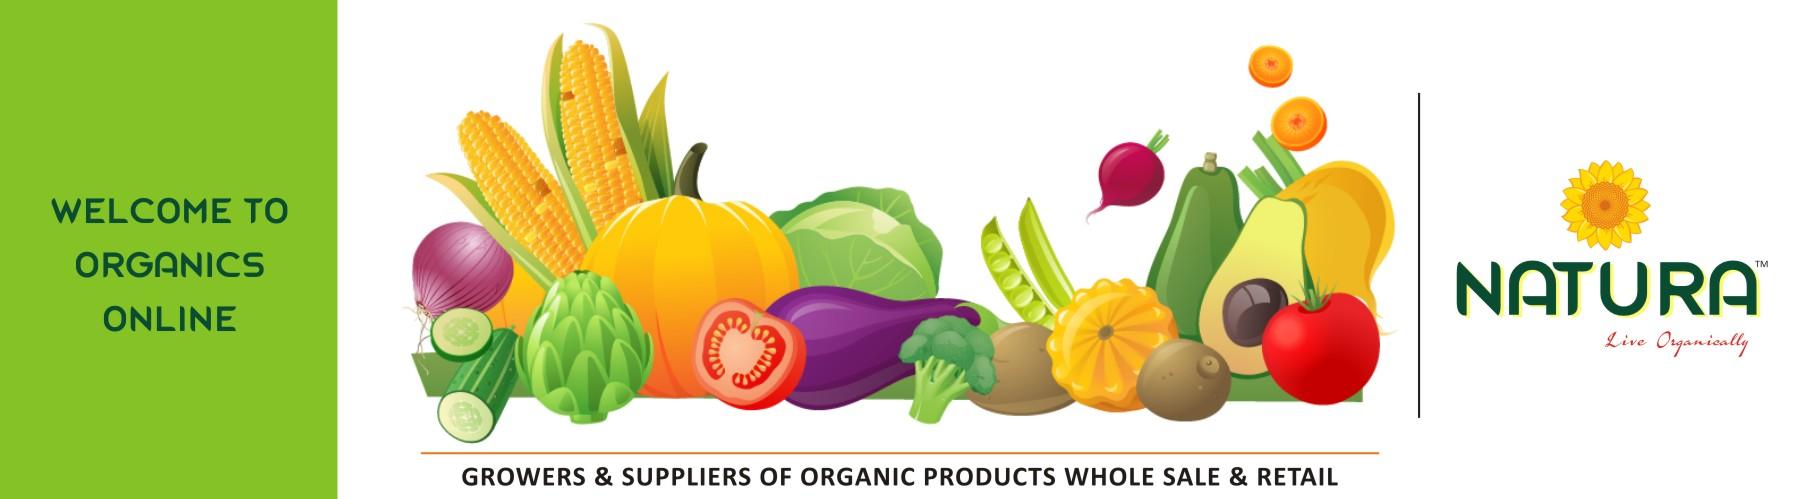 organics_online_banner